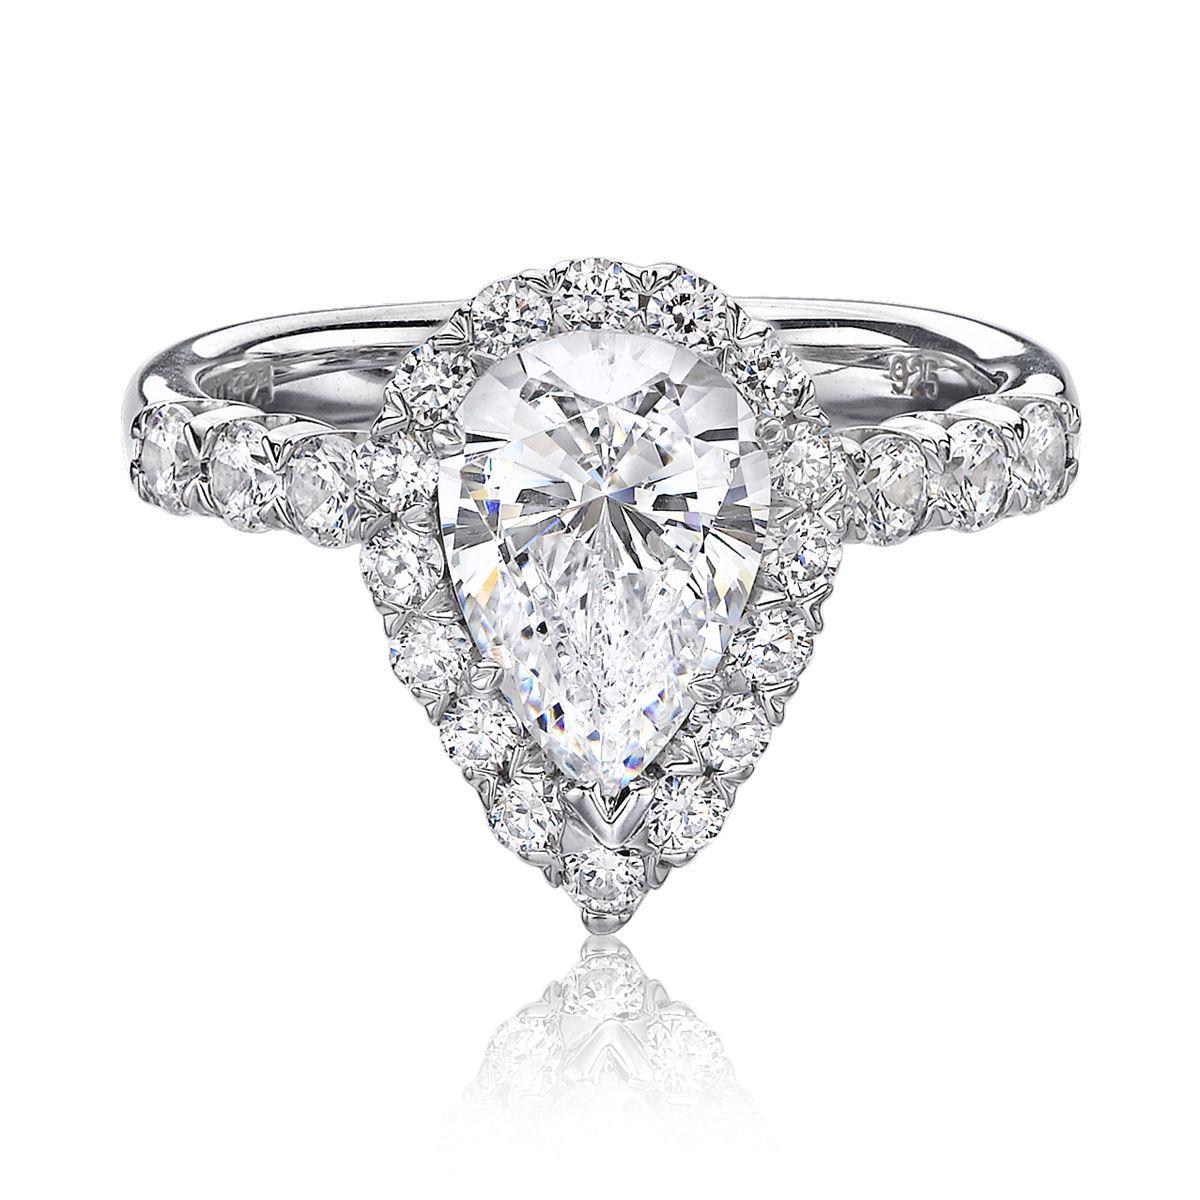 Engagement Rings York: Christopher Designs Of New York Diamond Engagement Ring